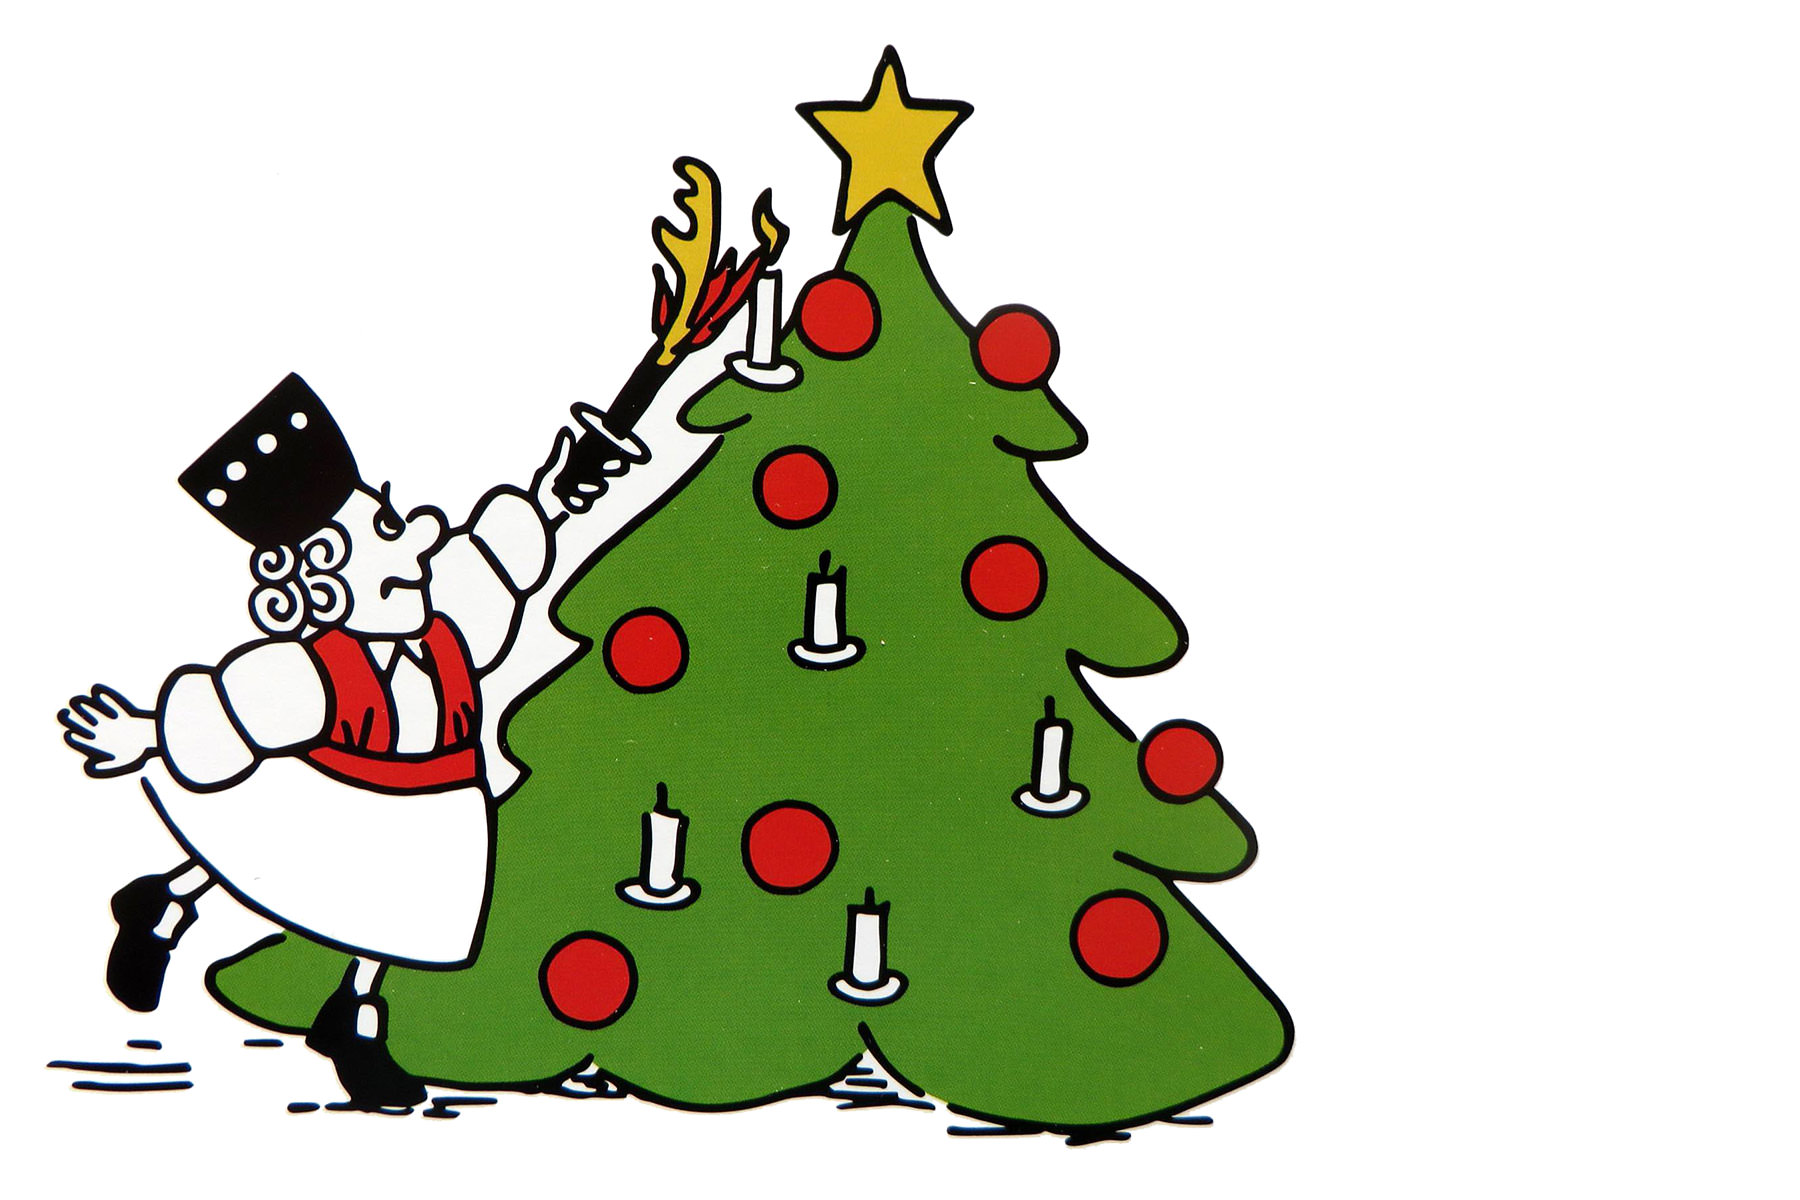 Merret wünscht frohe Weihnachten